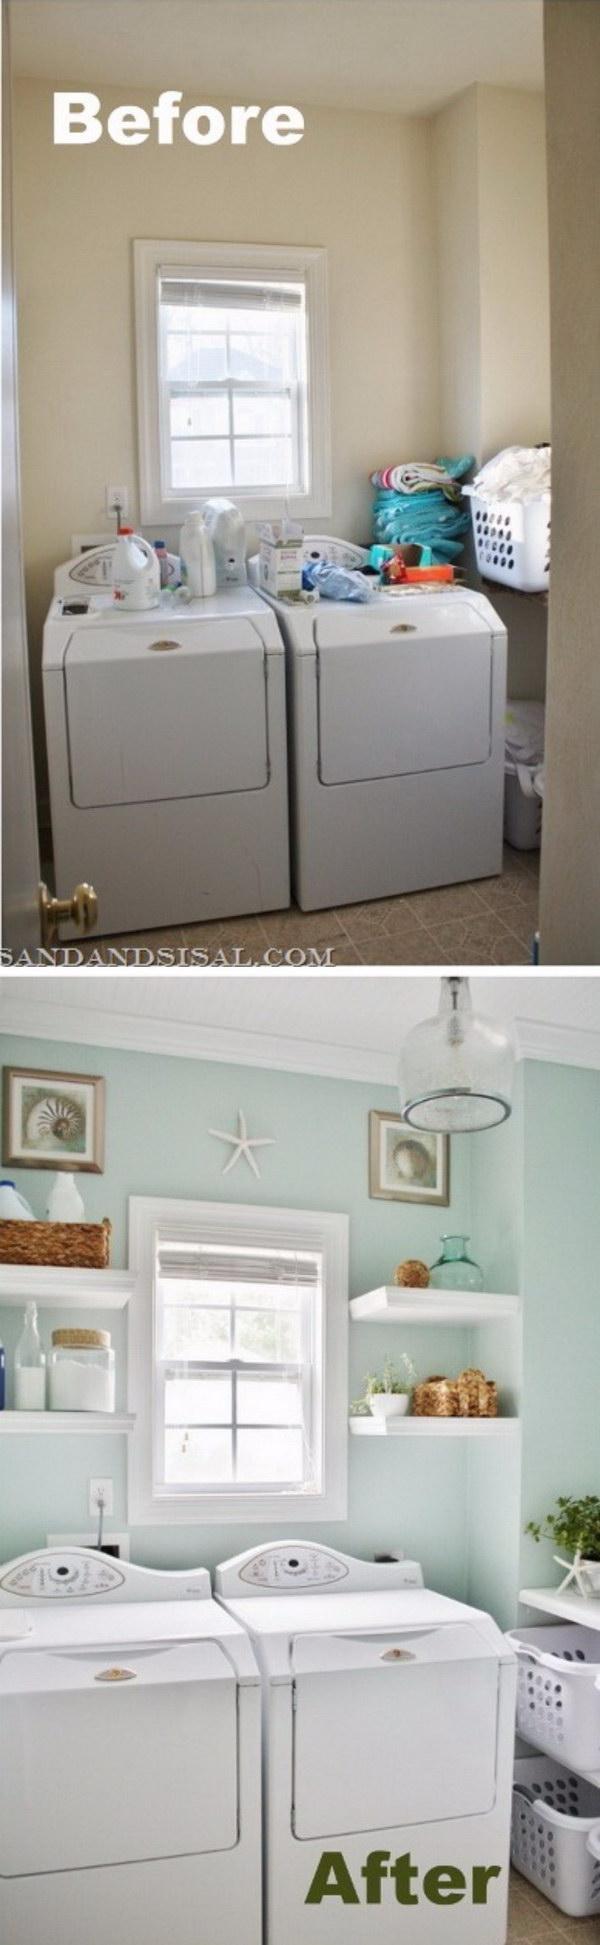 DIY Budget Laundry Room Makeover with Coastal Design Flavor.